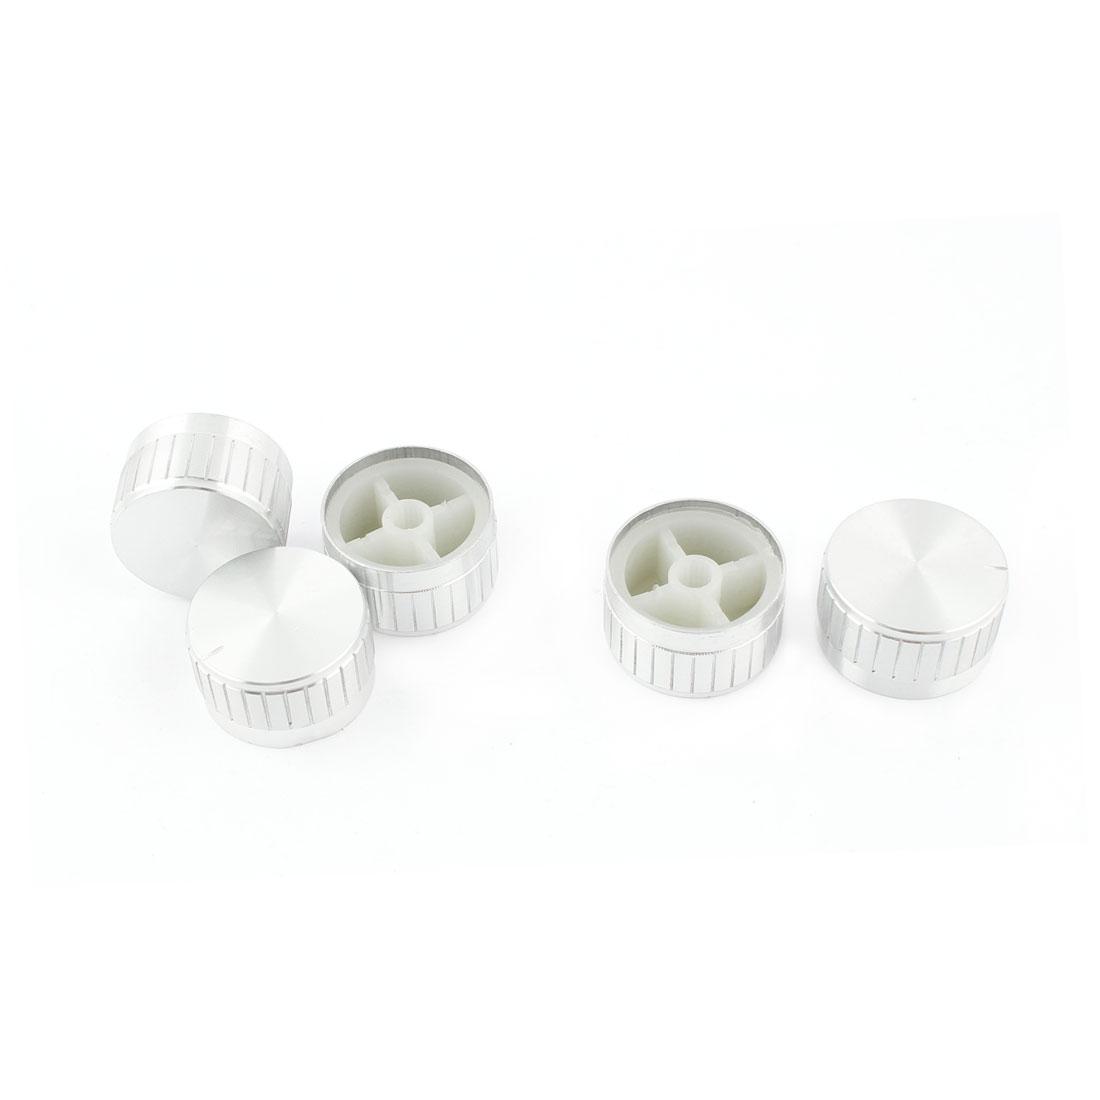 Unique Bargains 5 x Adjustable Turn 5.5mm Shaft Insert 30mm Potentiometer Rotary Control Knob - image 1 of 1